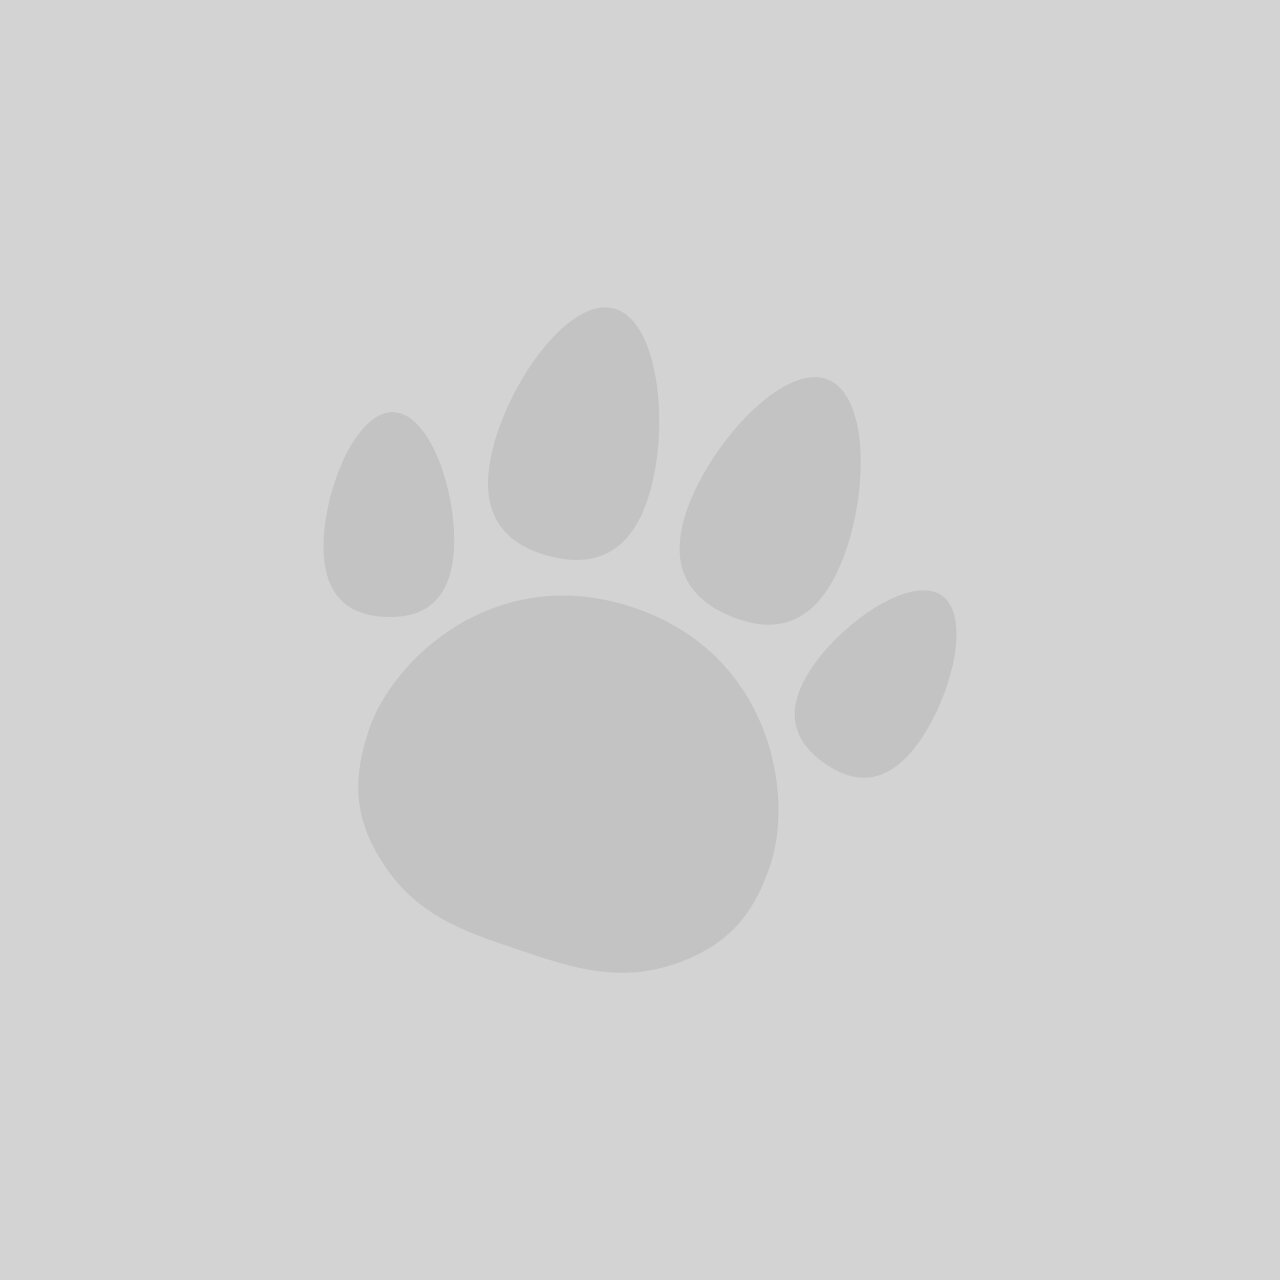 Doodlebone Airmesh Dog Harness Orange Medium